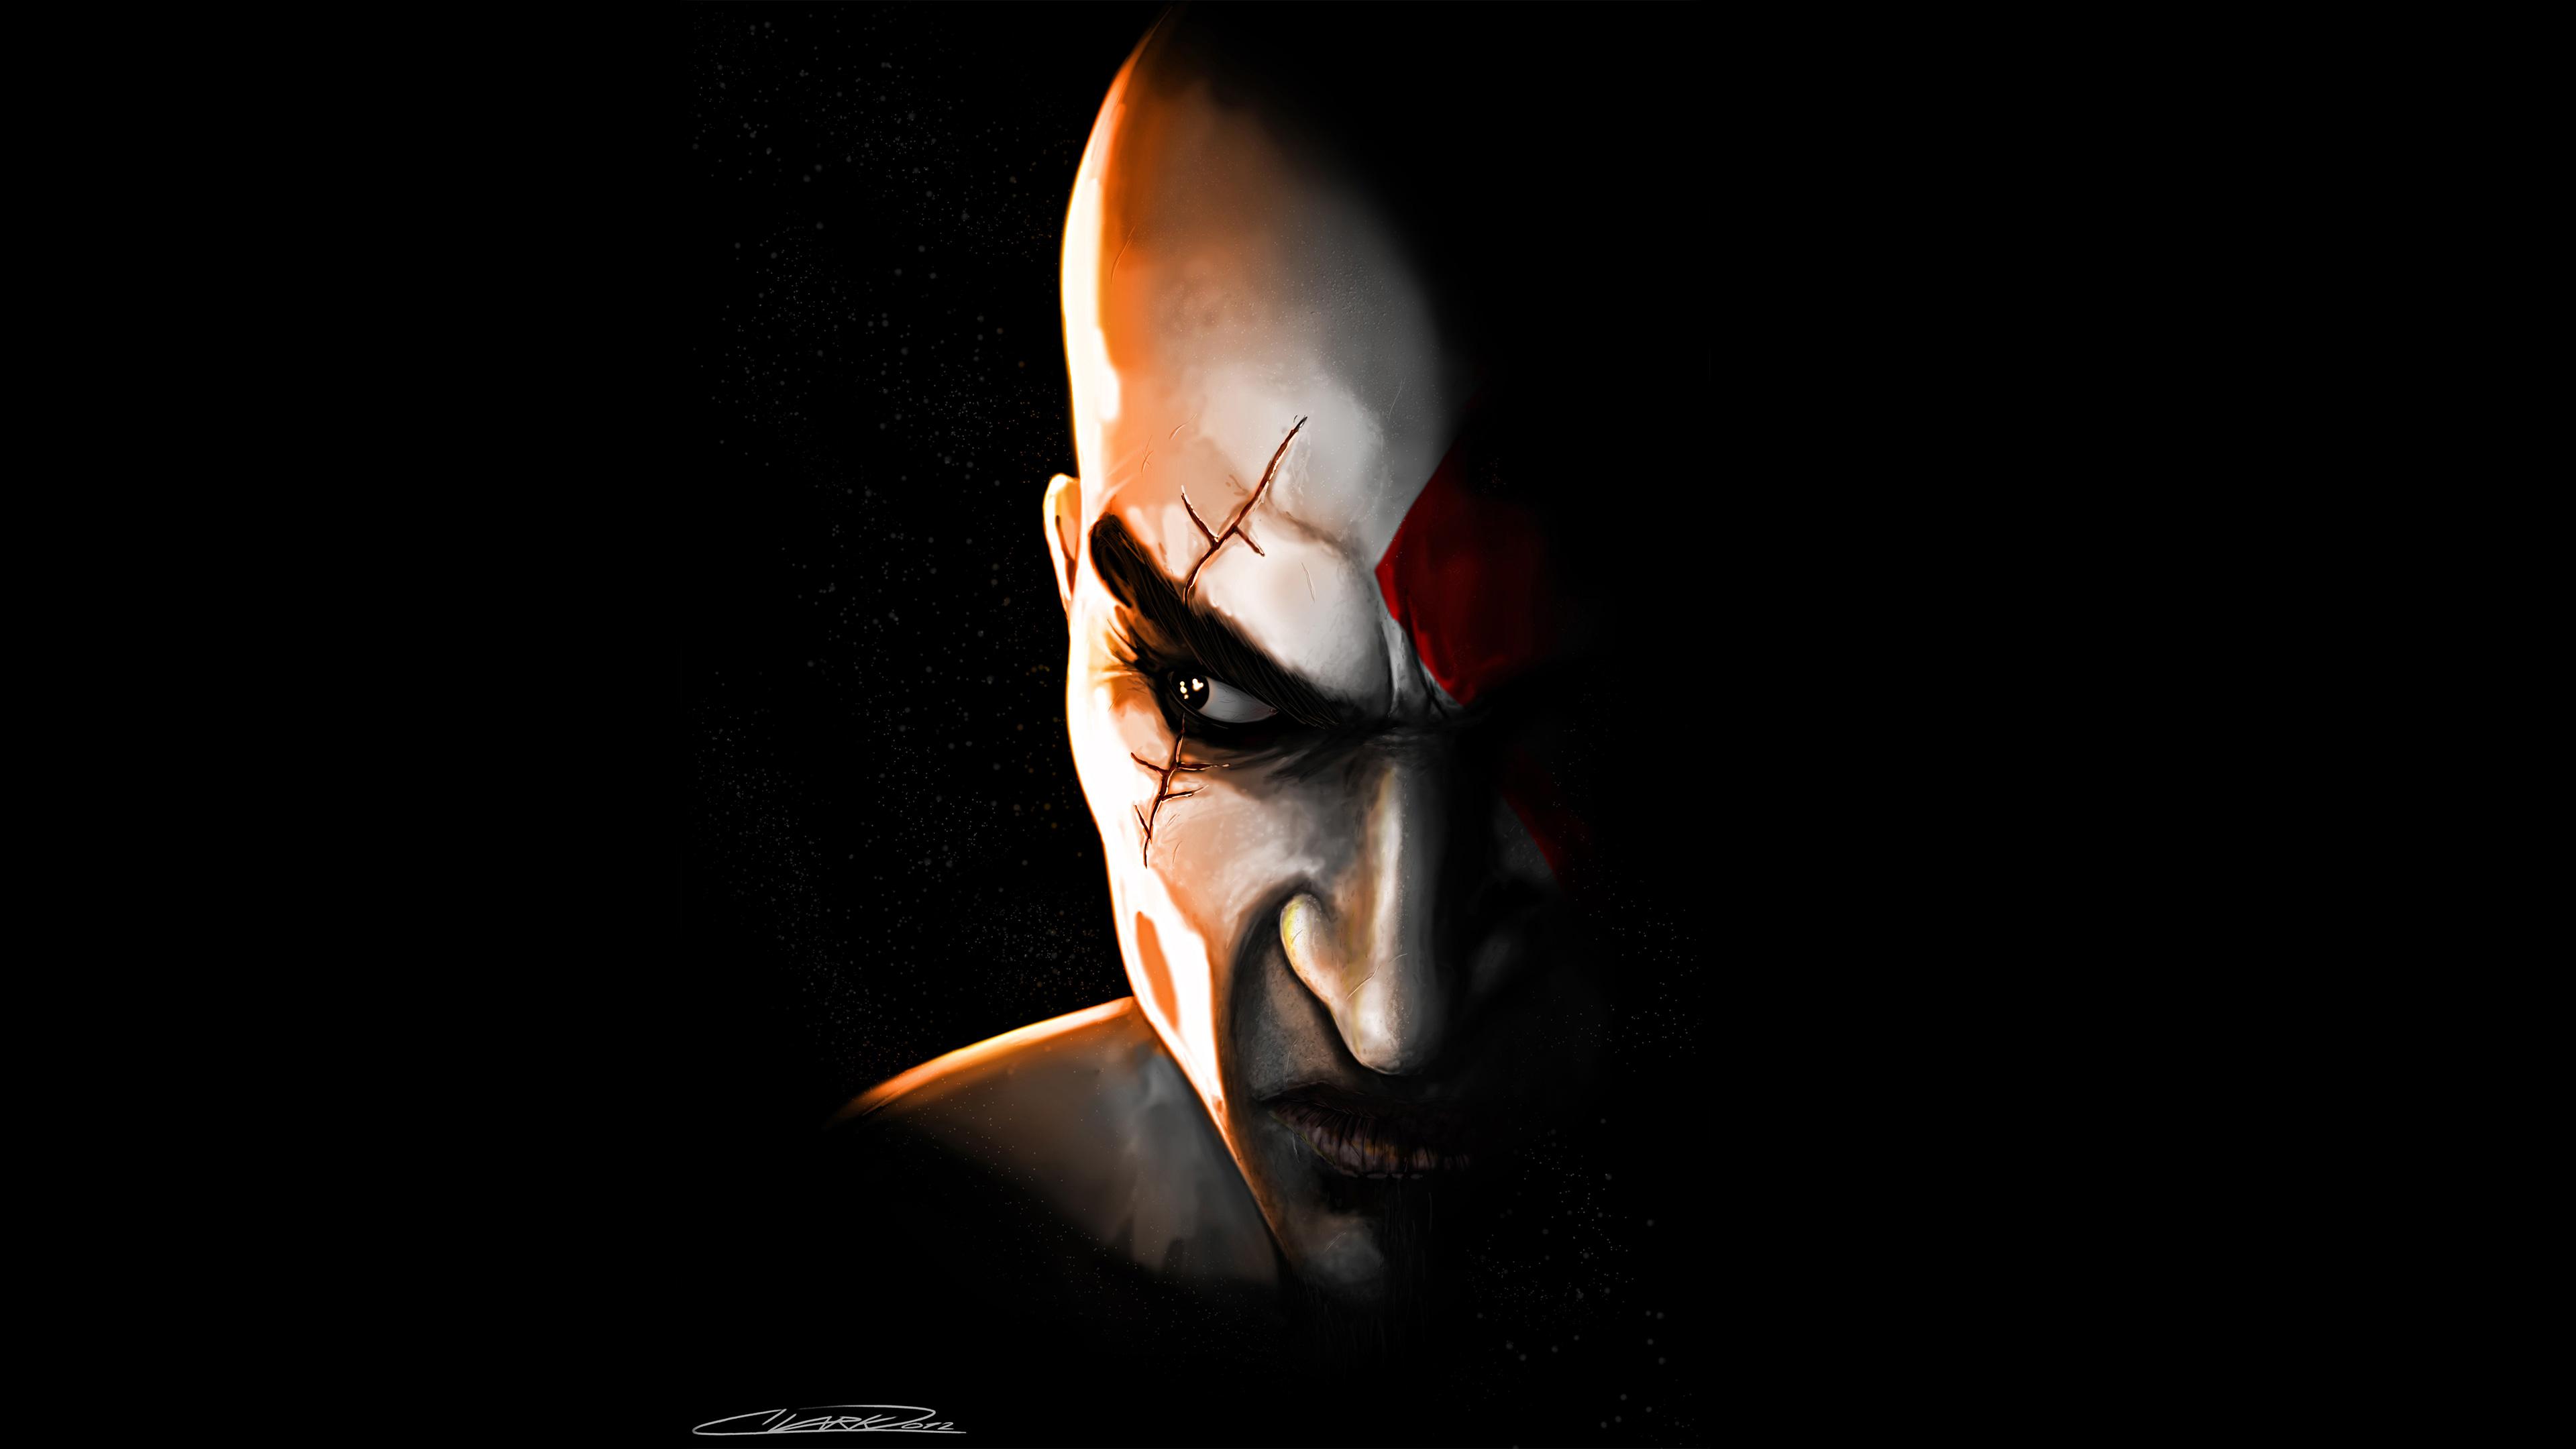 3840x2160 Kratos In God Of War Game 4k Hd 4k Wallpapers